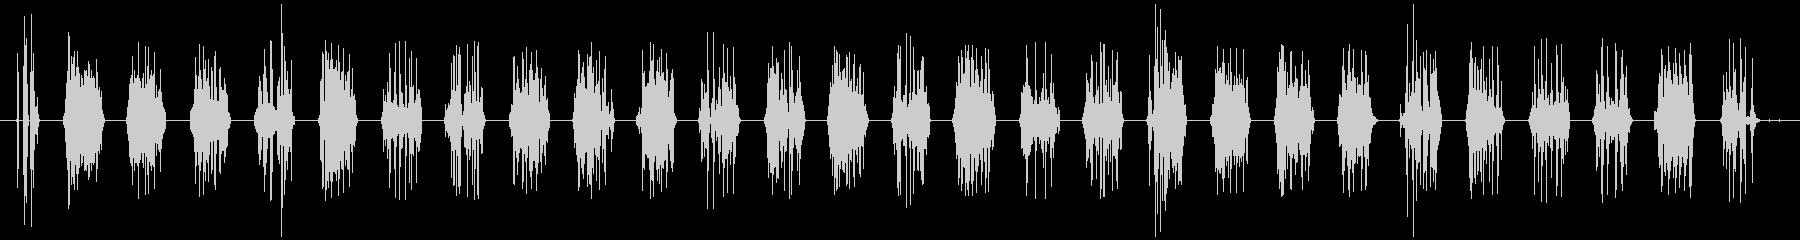 SynthVarious EC04...の未再生の波形